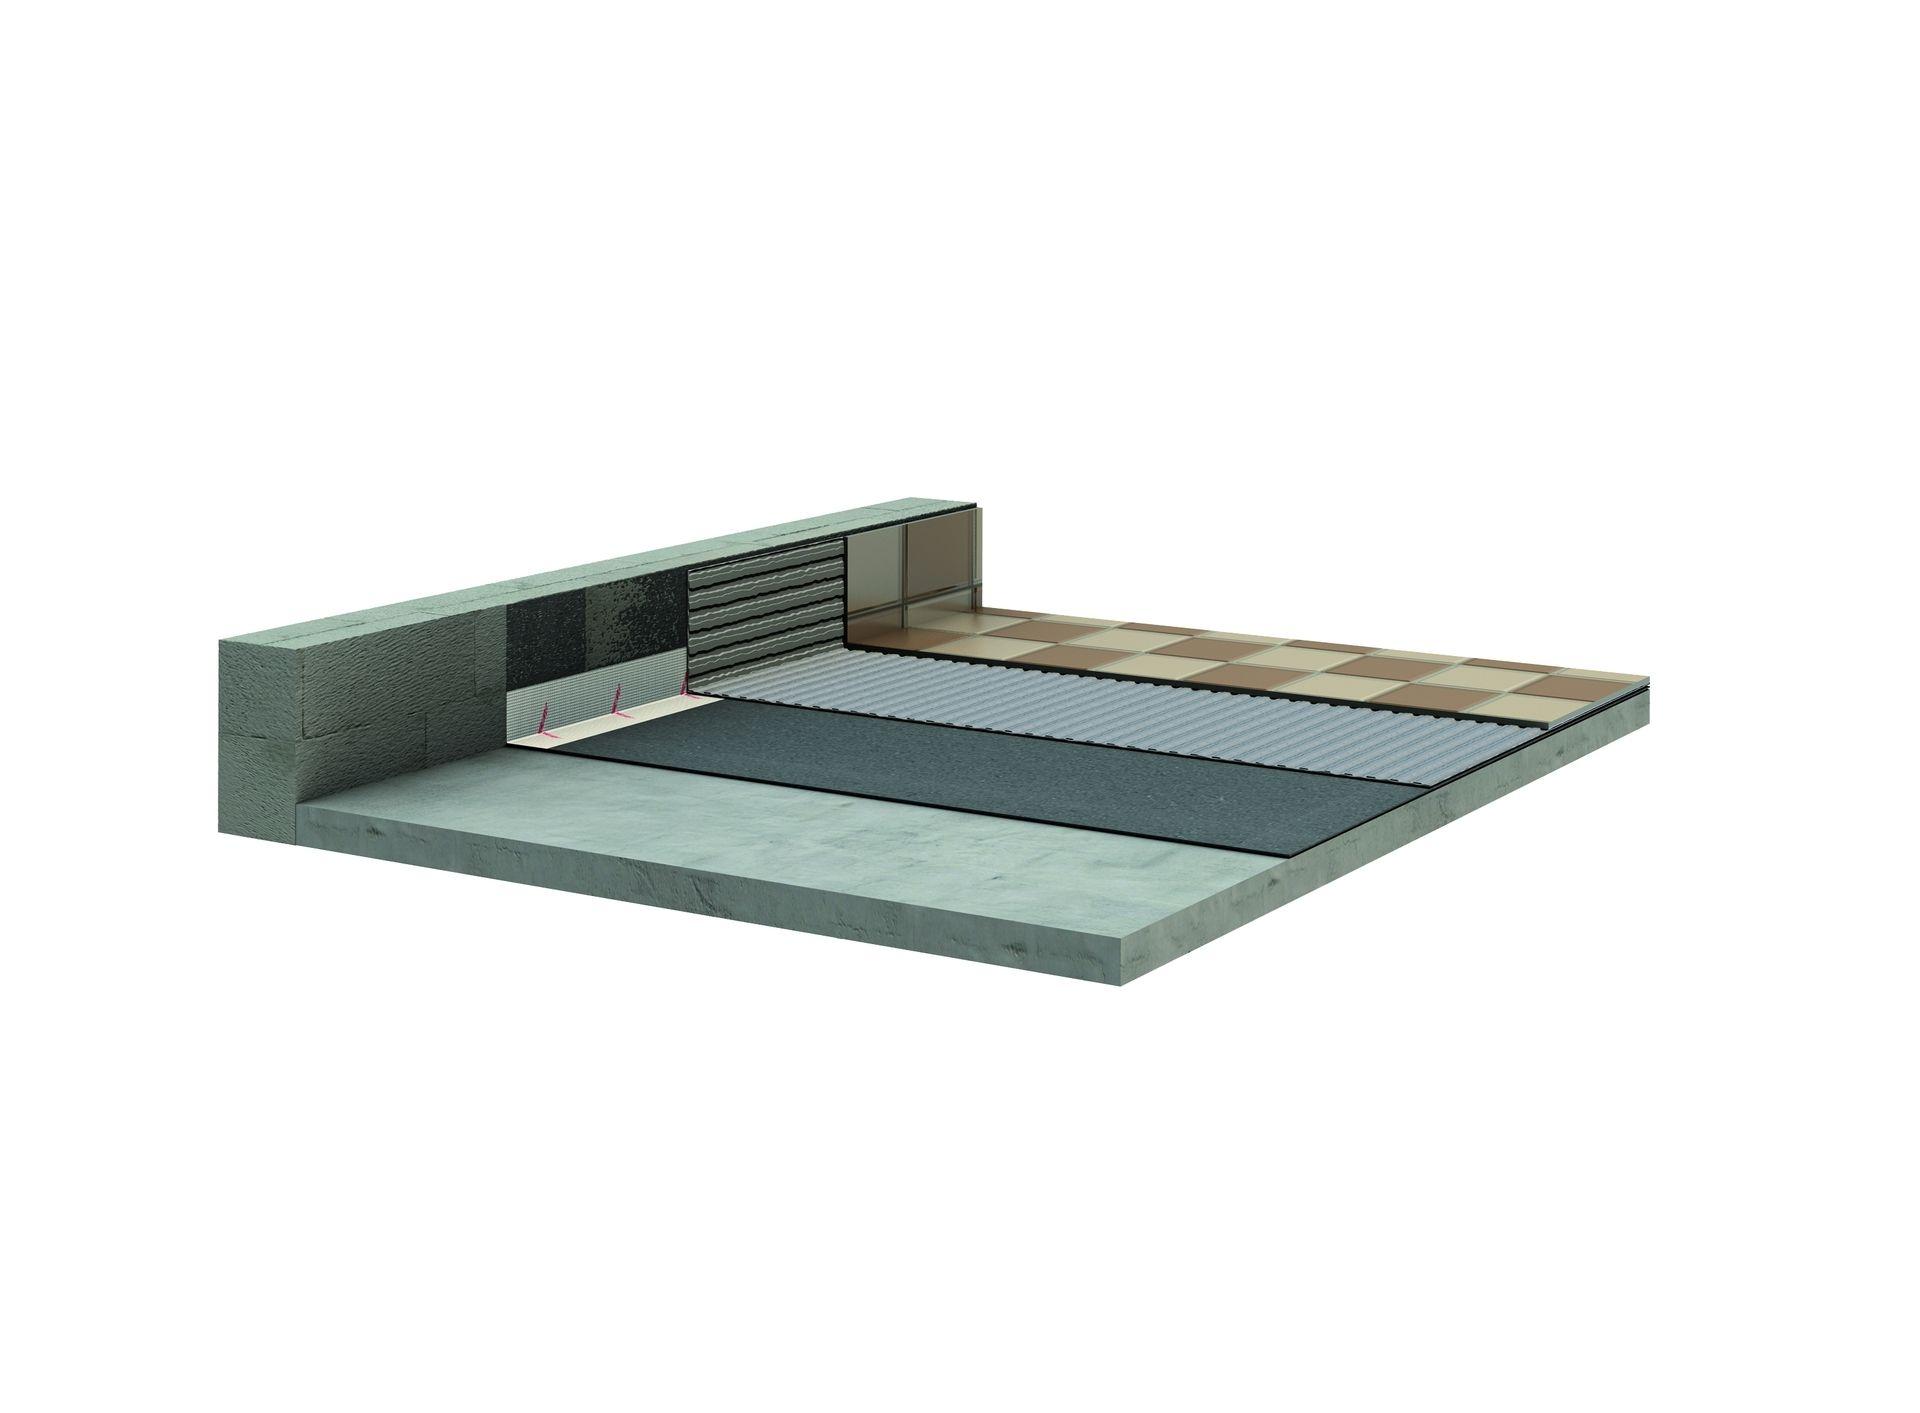 terrasse abdichten anleitung fo16 hitoiro. Black Bedroom Furniture Sets. Home Design Ideas